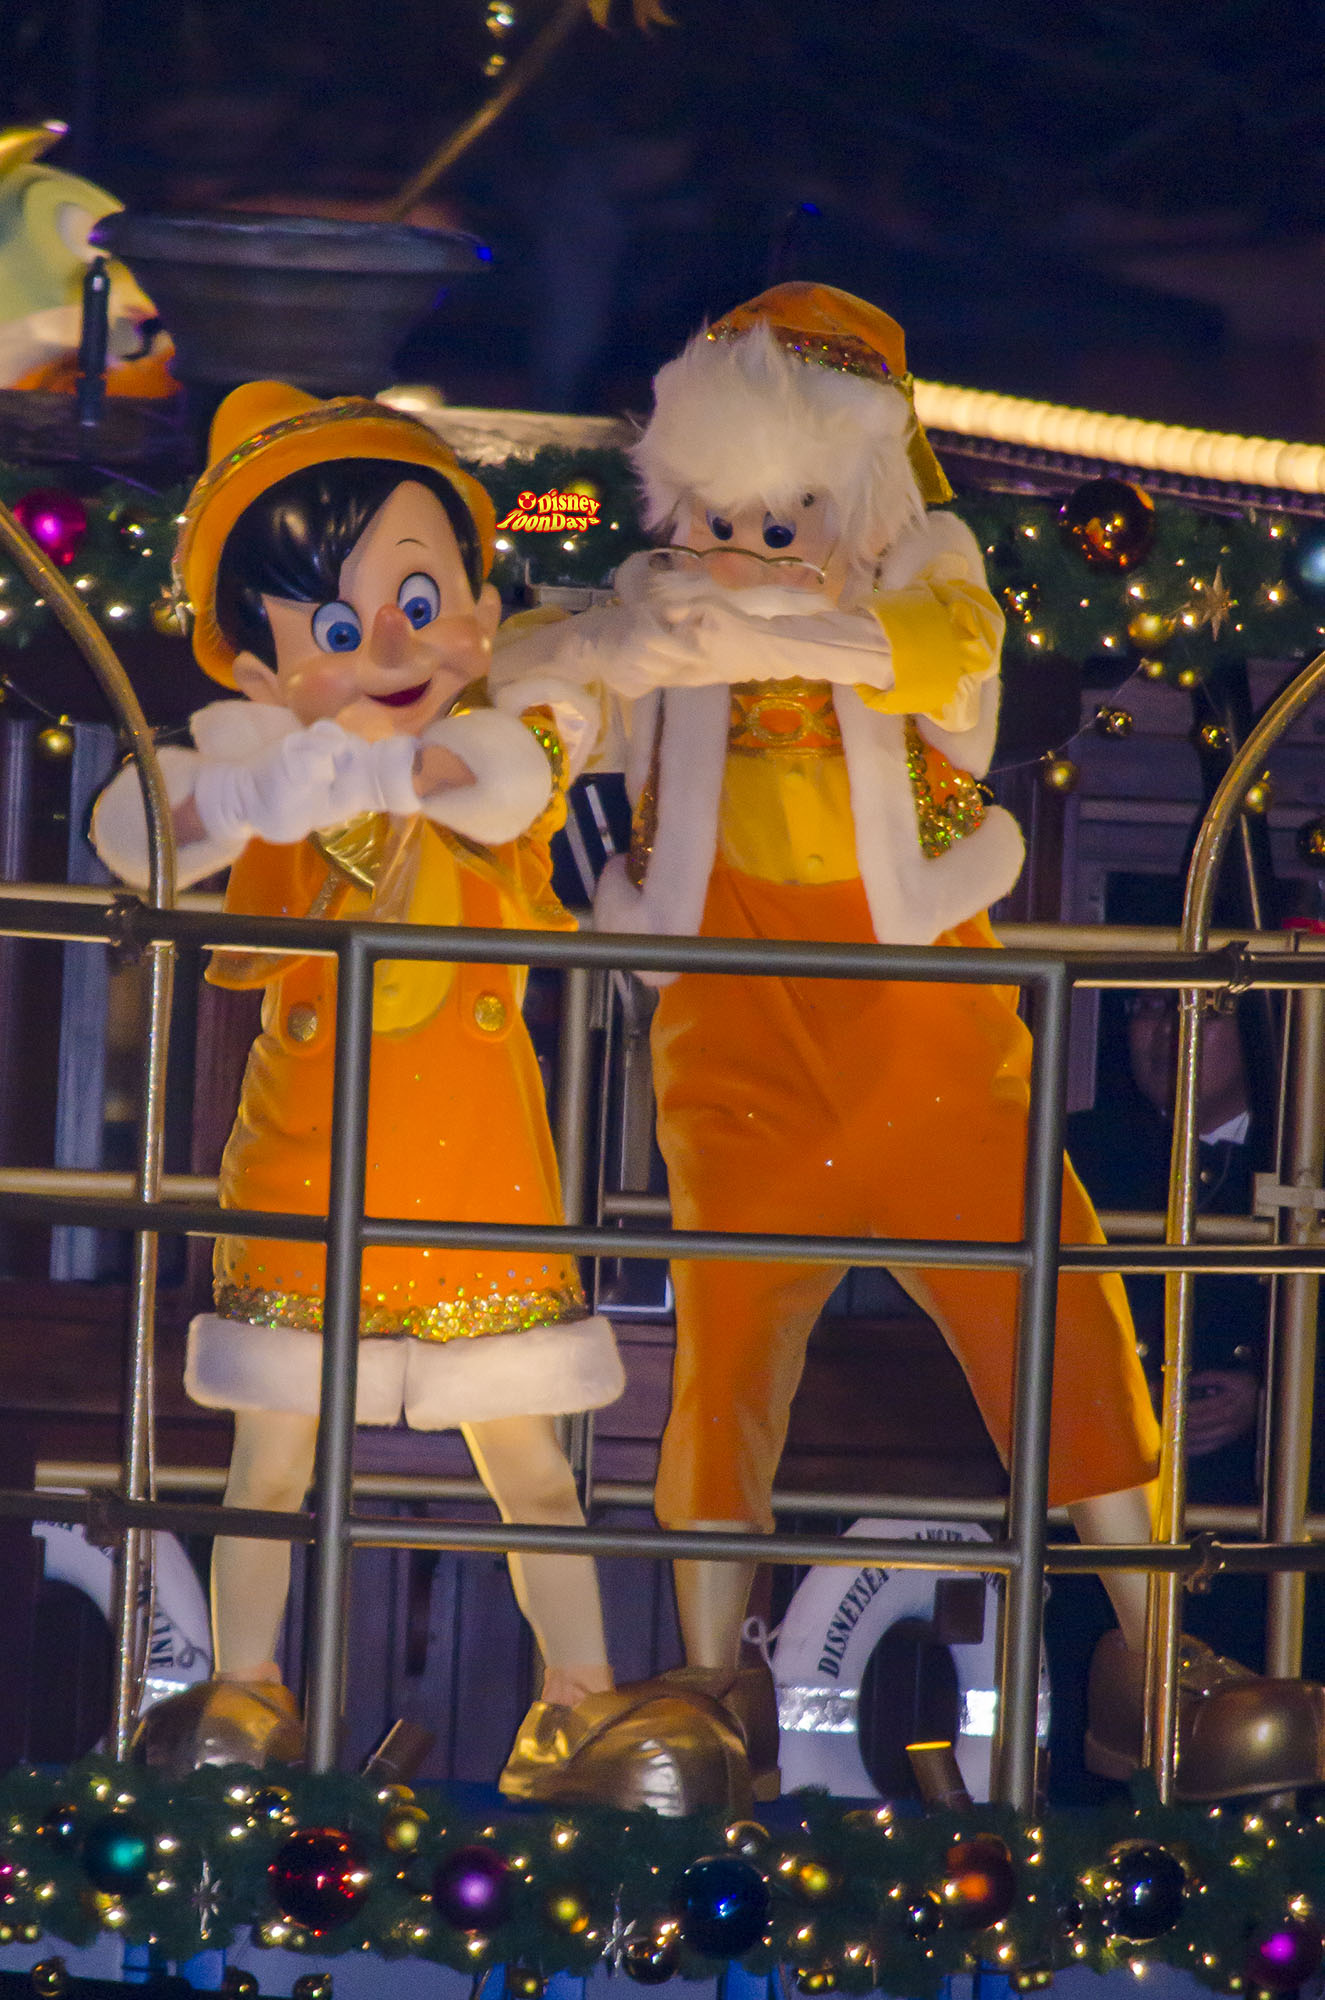 TDS クリスマスウィッシュ 2013 カラーオブクリスマス ピノキオ ゼペット